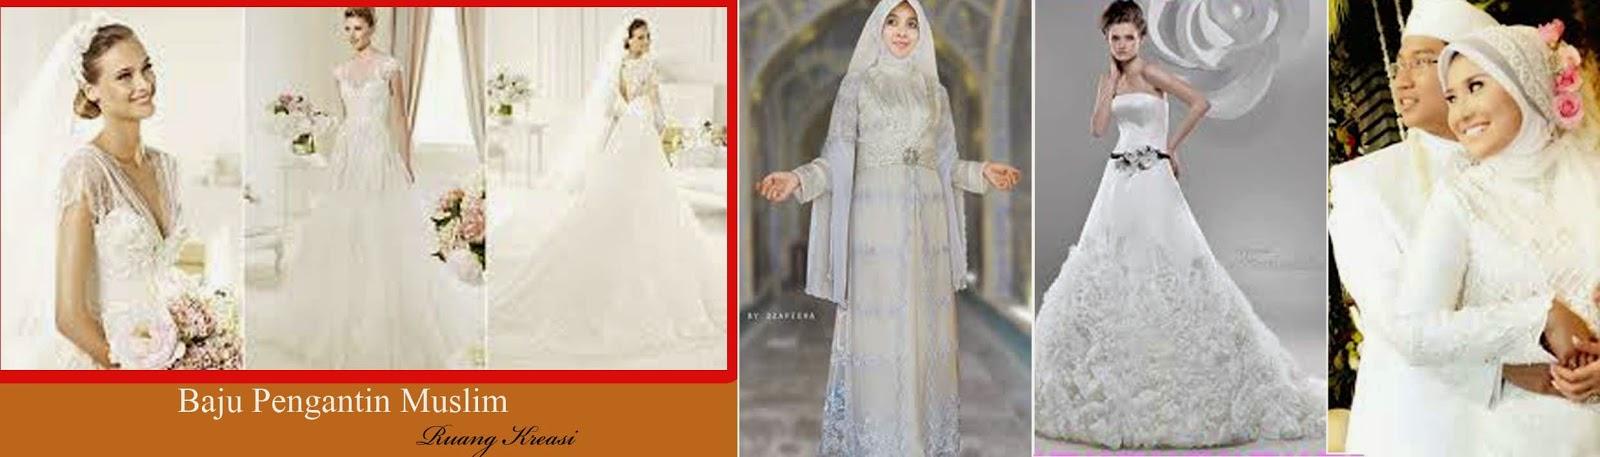 baju pengantin muslim, Baju pengantin muslimah, baju pengantin syar'i, design baju pengantin, gaun pengantin muslimah, kebaya pengantin, koleksi baju pengantin, pakaian pengantin